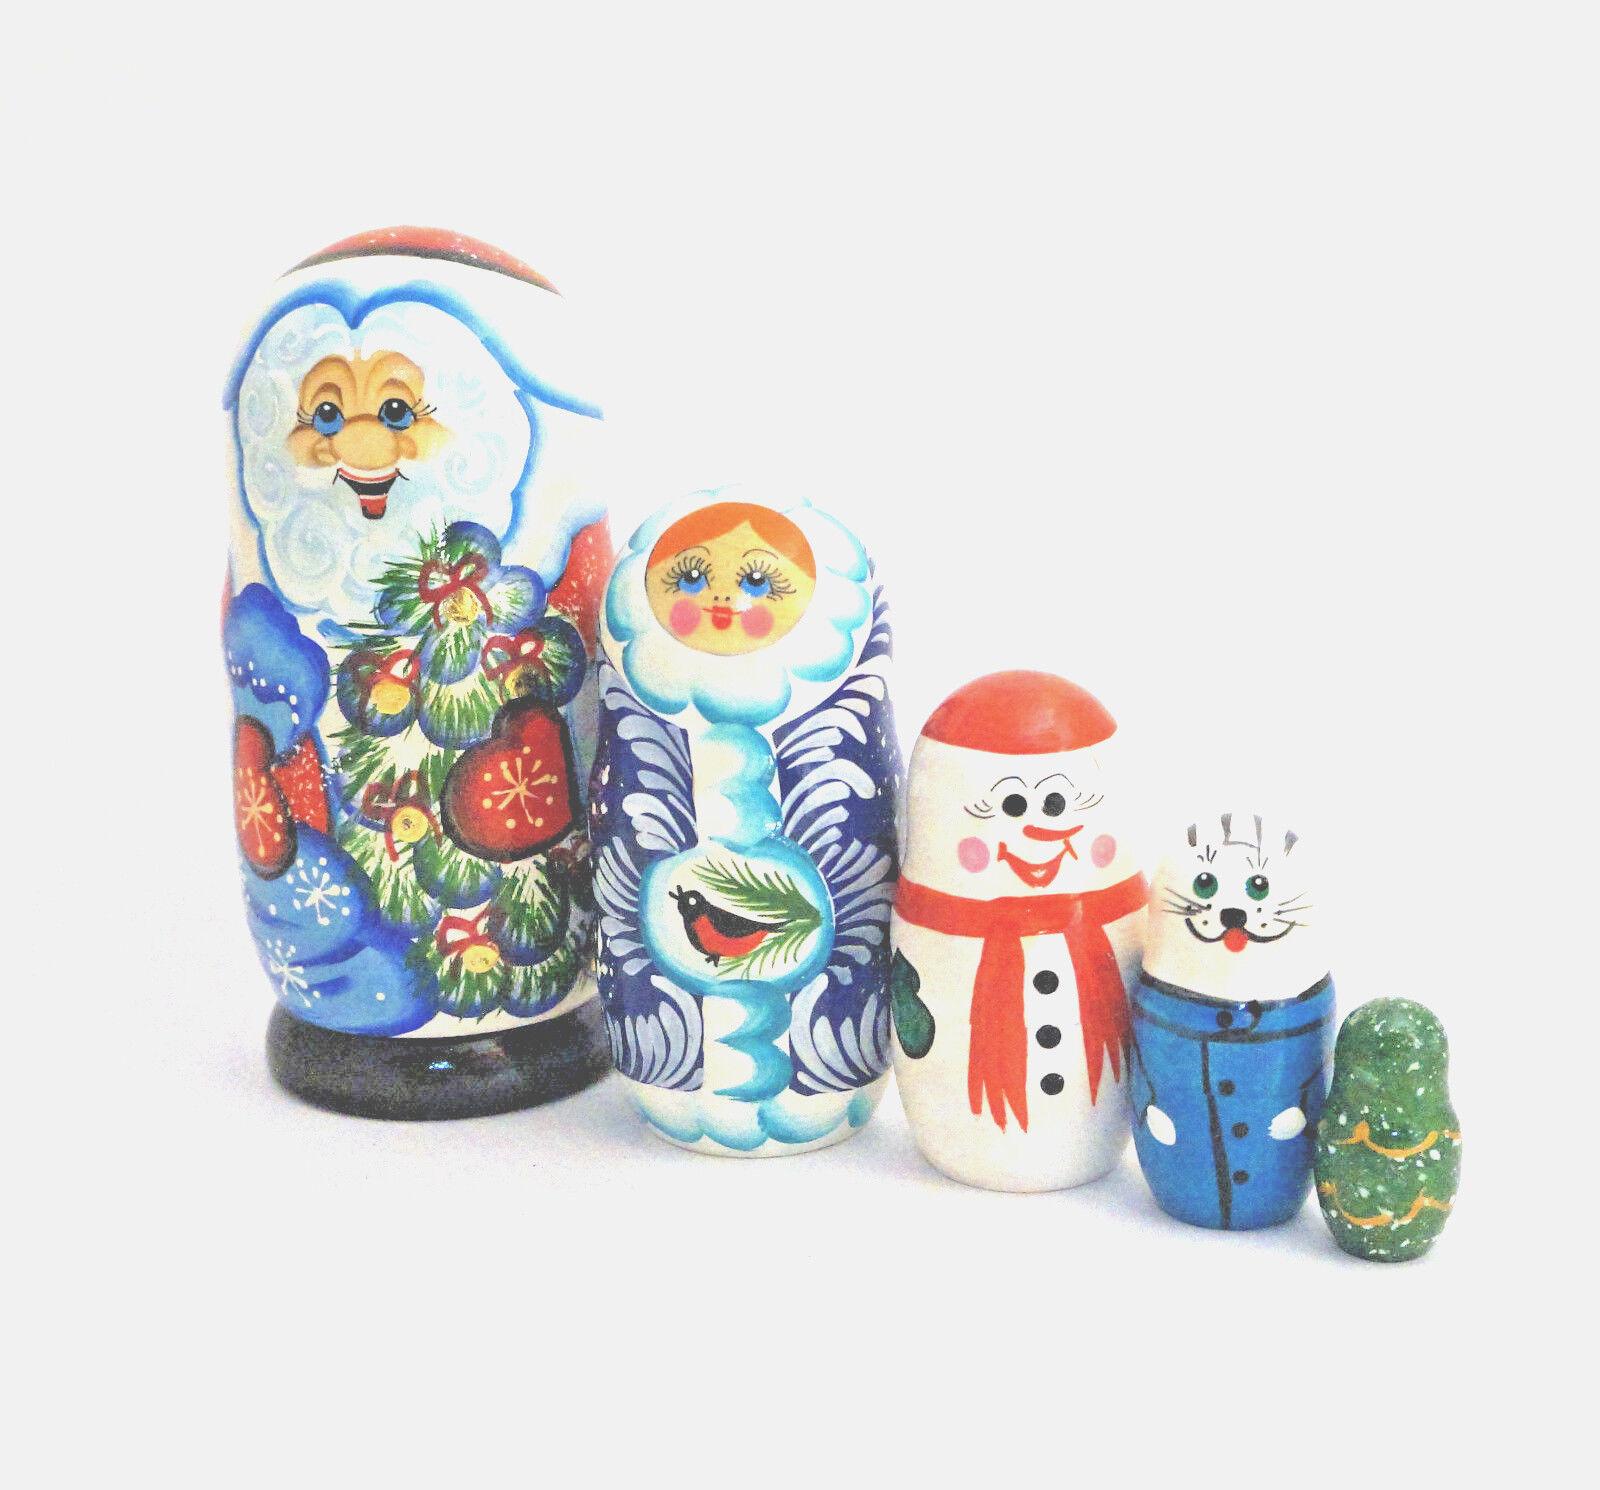 5 Pc Russian Nesting Doll , Matreshka Doll - Santa Santa Santa  7  Tall 89284b